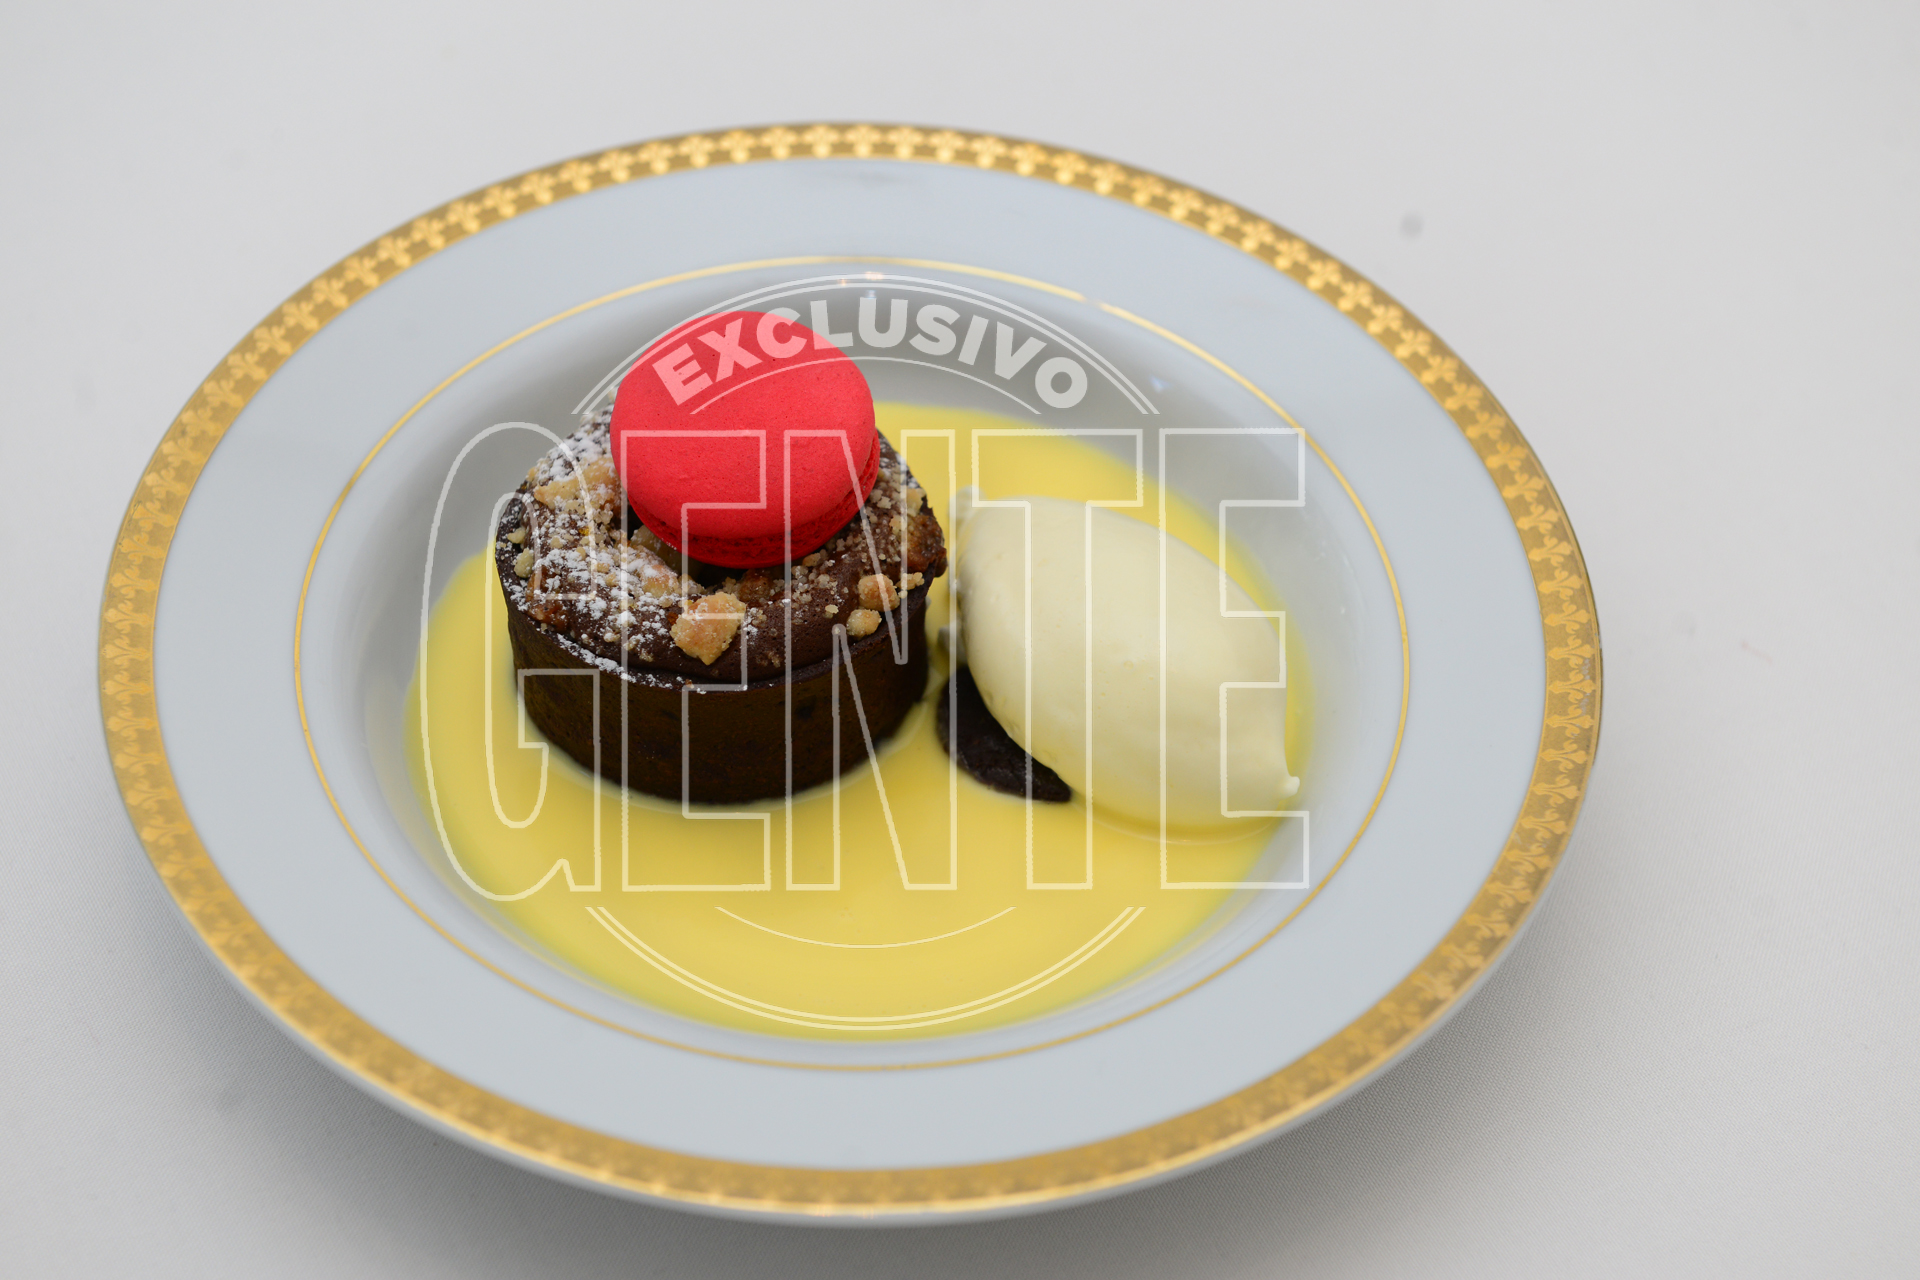 Capuchino, salsa de vainilla, souffle de chocolate con café, lago de crema y macarron de chocolate.